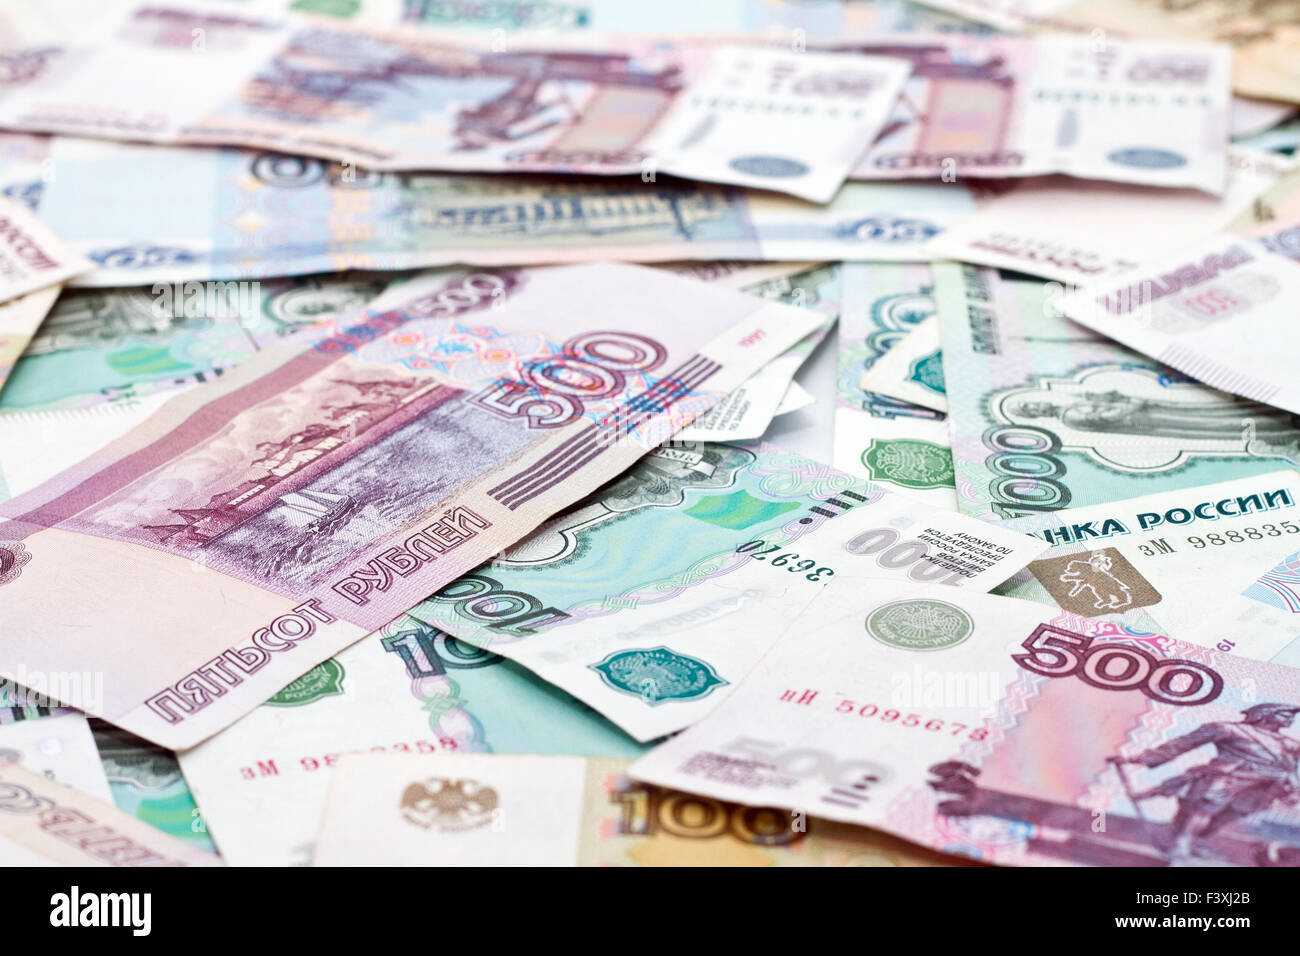 Money scattered on the floor Stock Photo